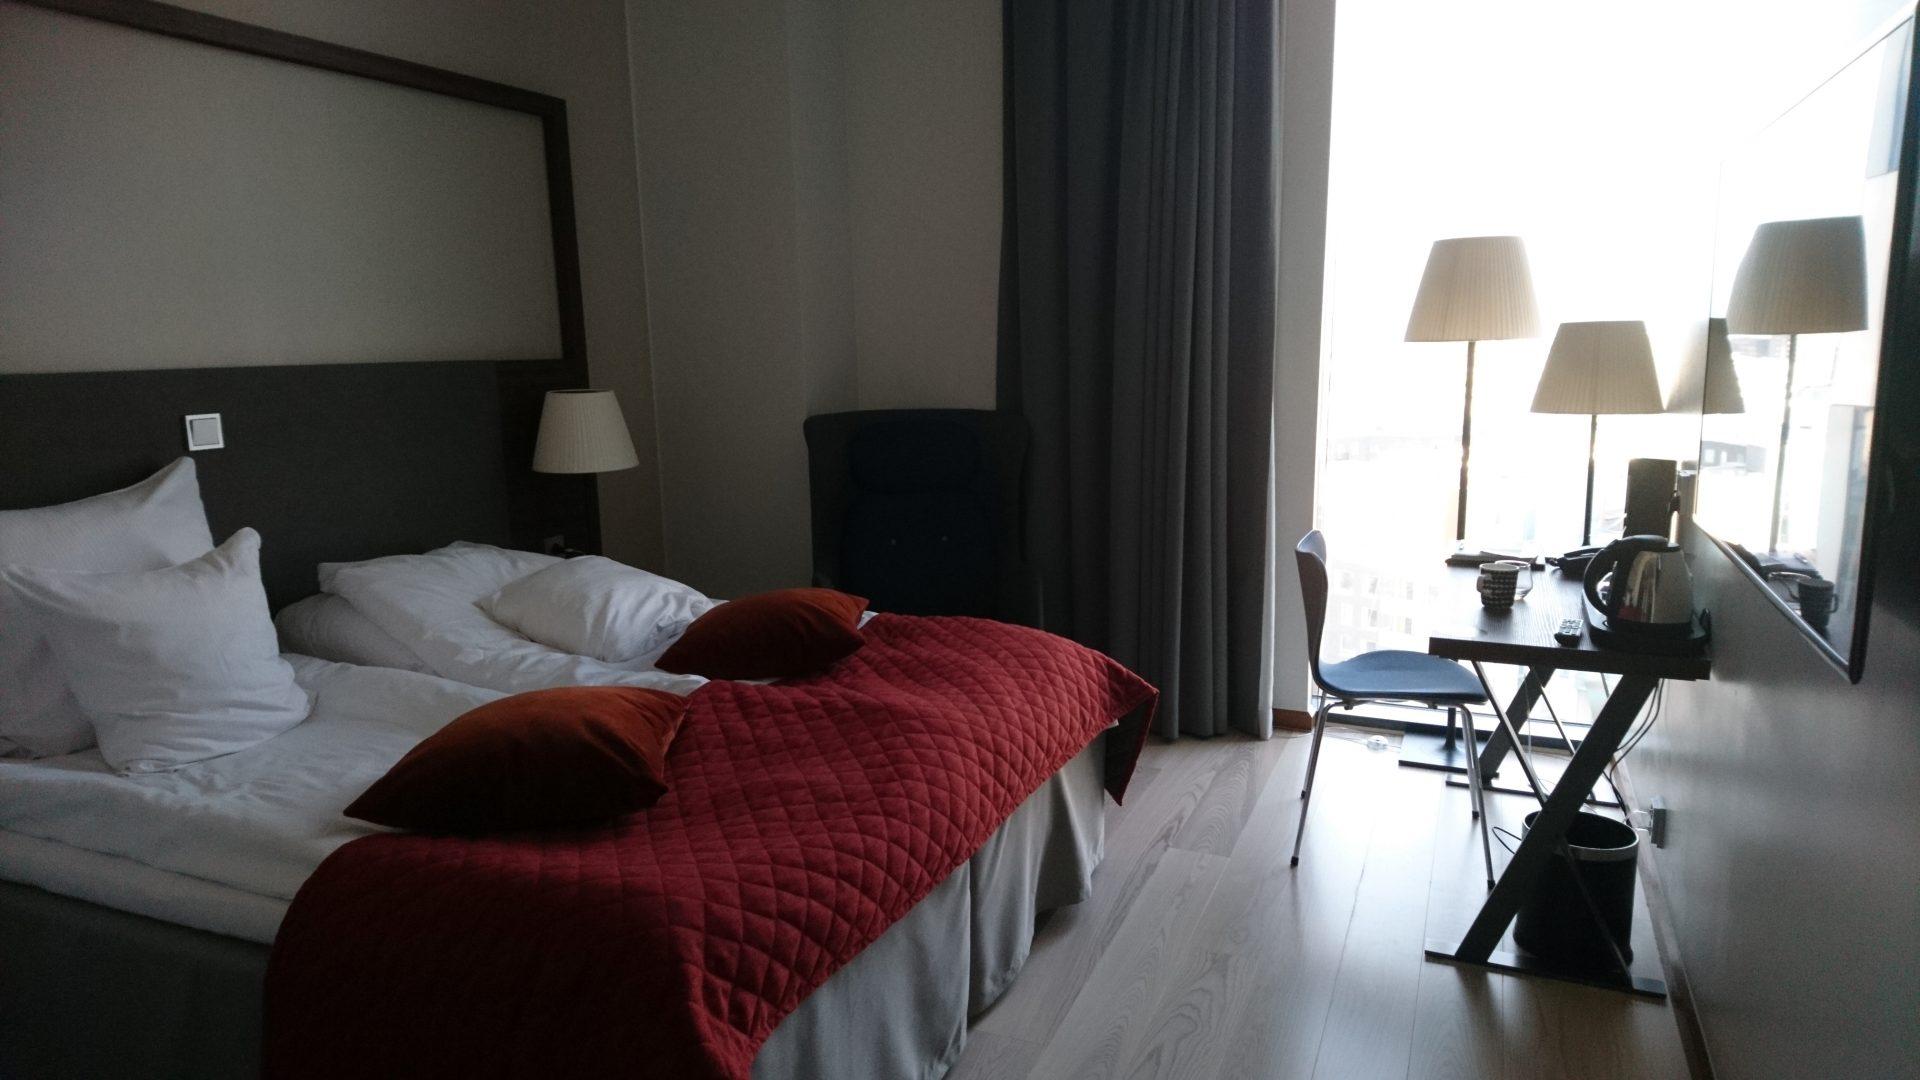 Hotels Alennuskoodi